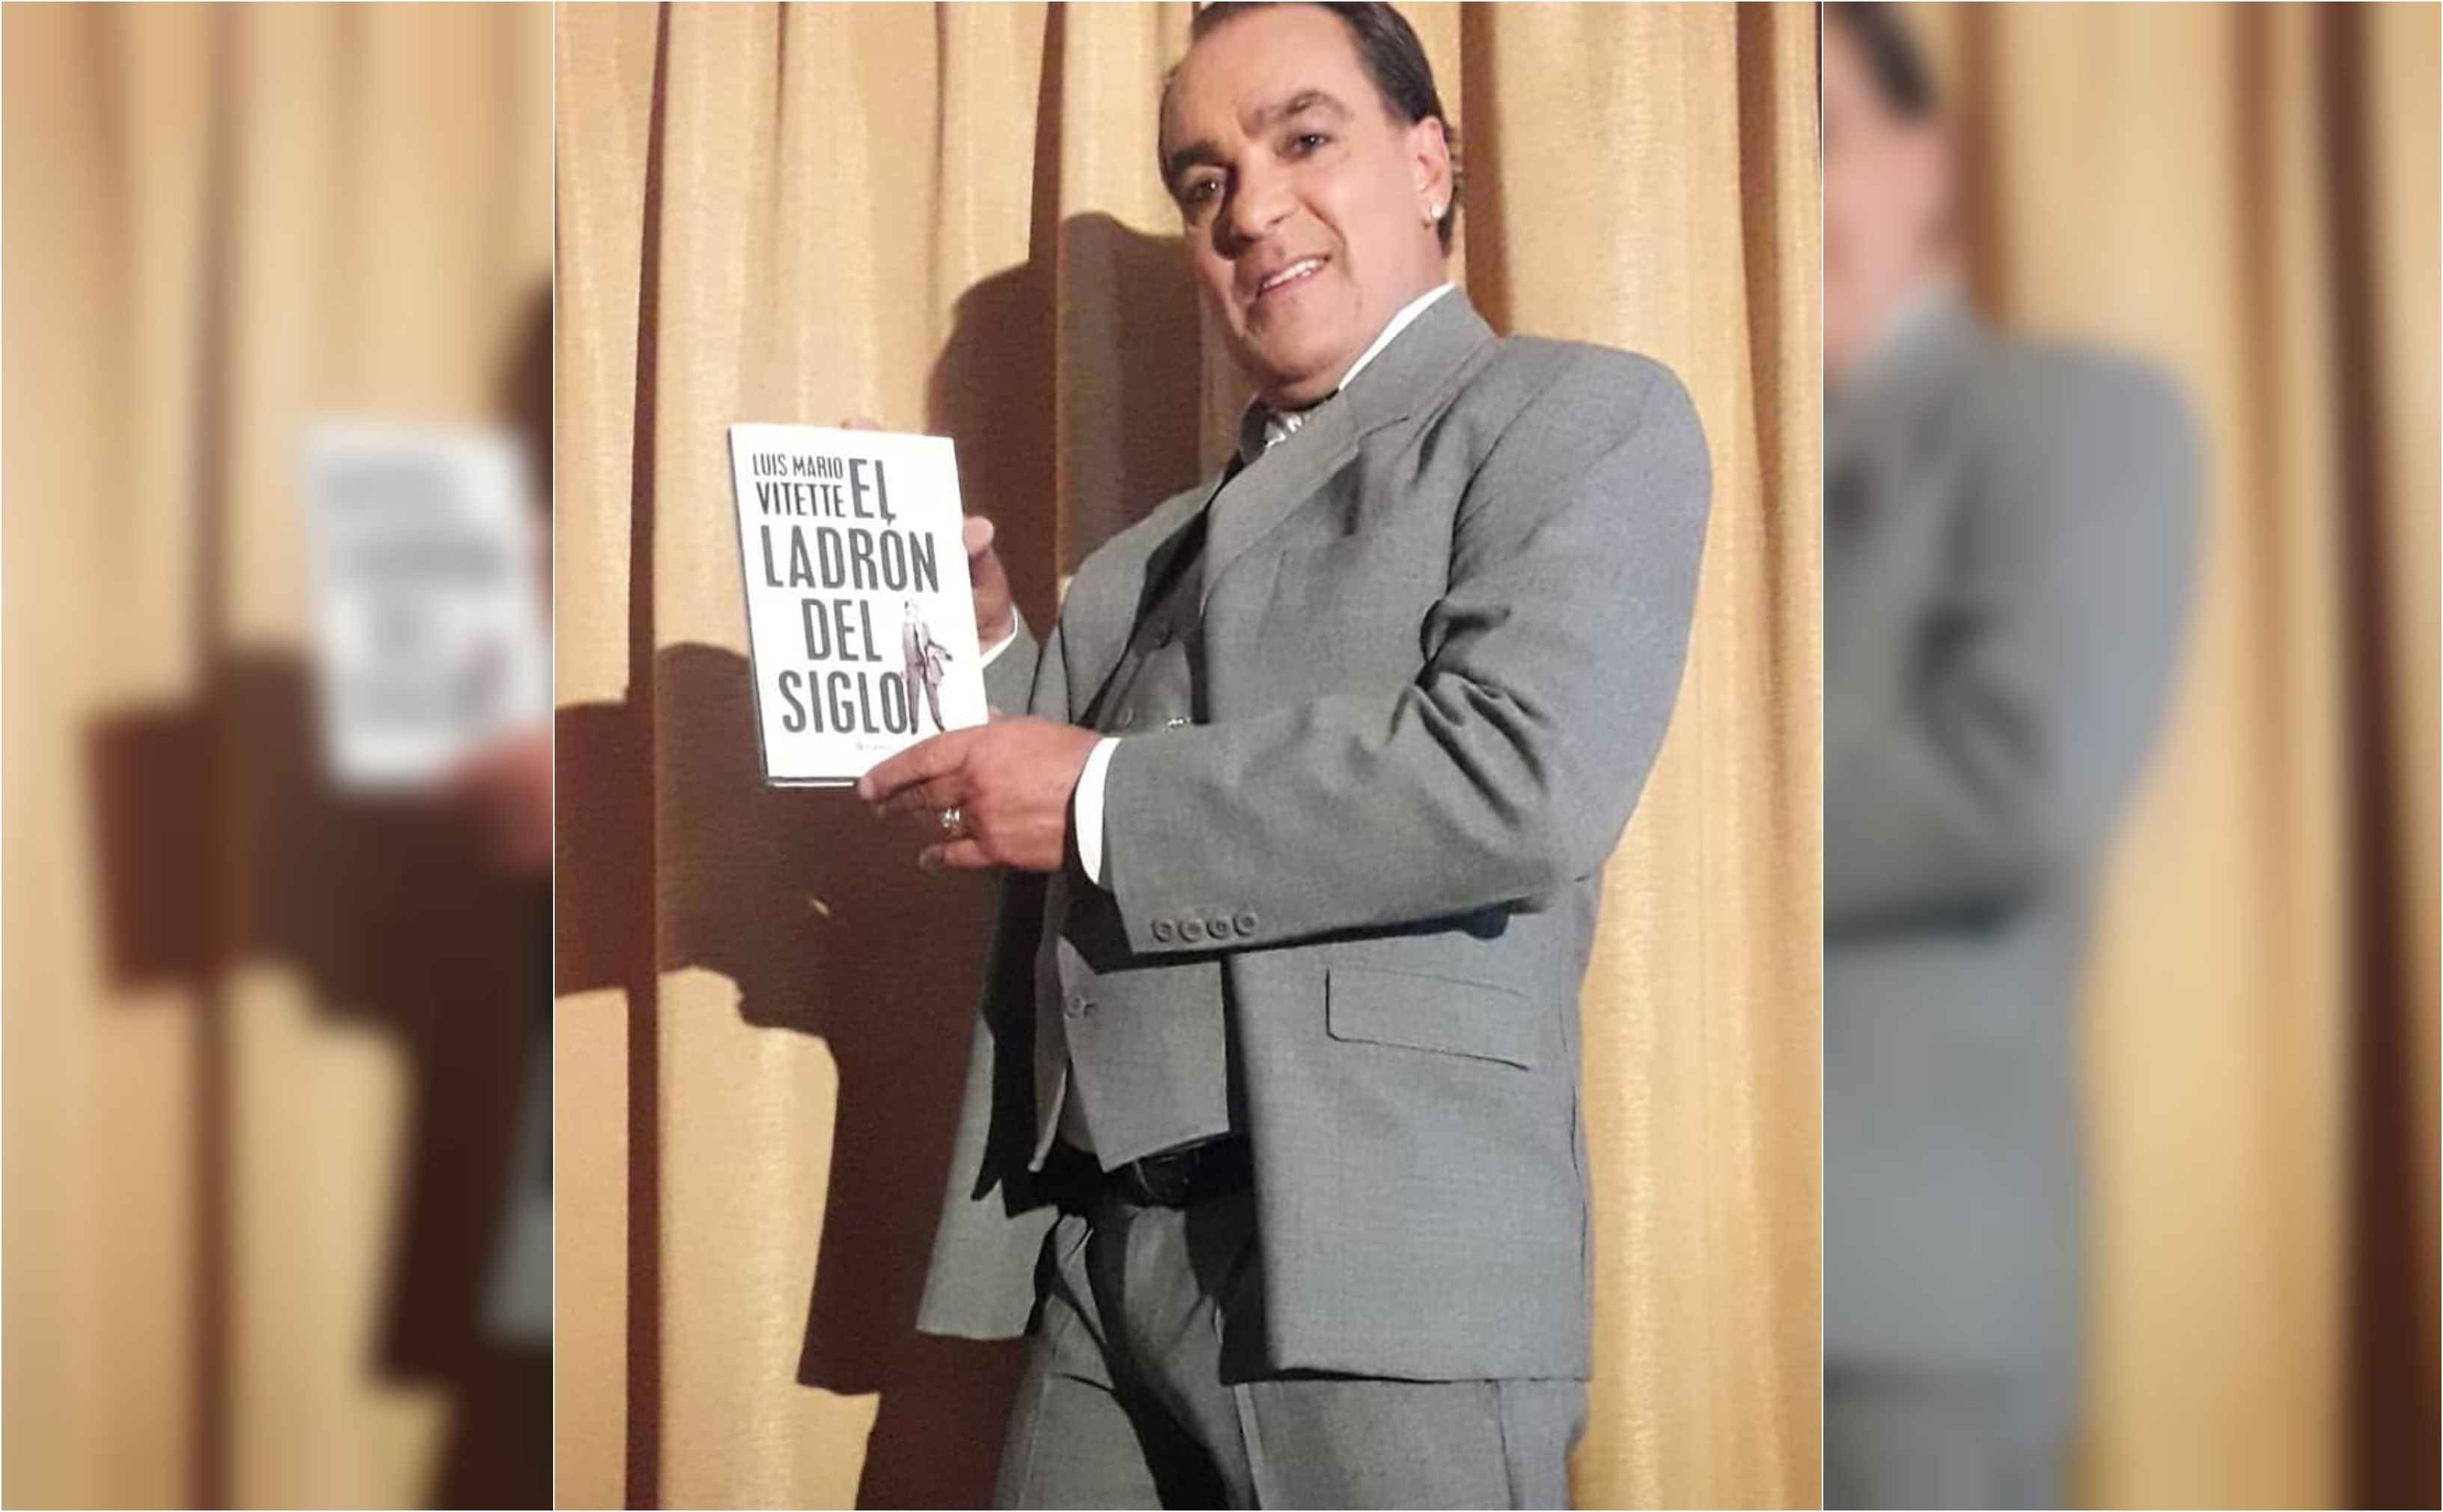 Luis Mario Vitette Sellanes